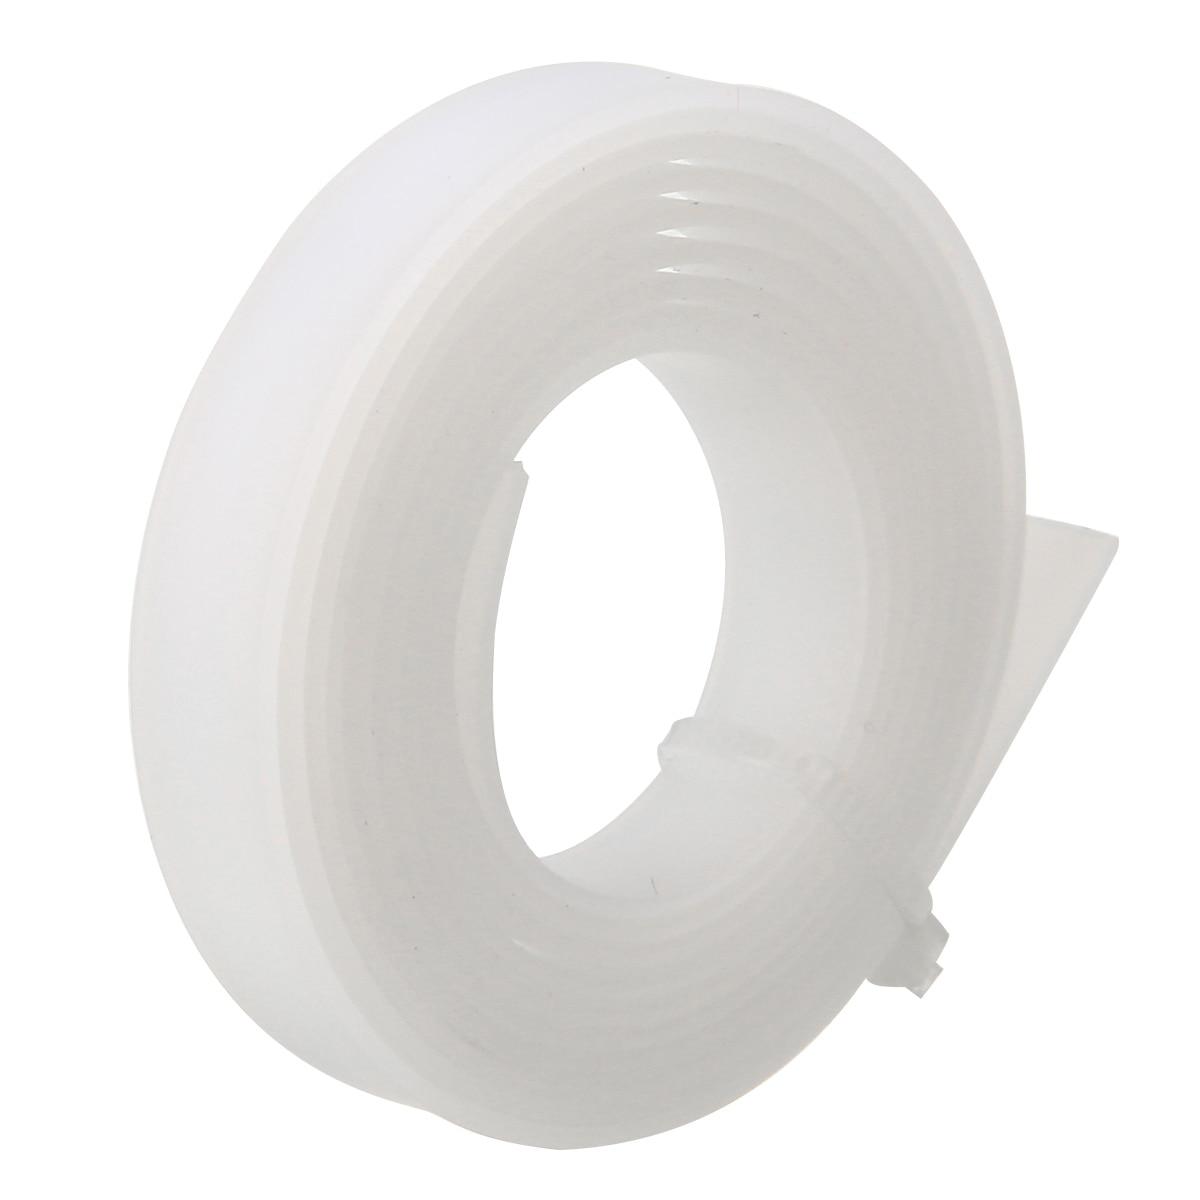 1 Roll Cutting Plotter Blade Strip Protection Guard Tape Vinyl Cutter Strips 100cmx8mm1 Roll Cutting Plotter Blade Strip Protection Guard Tape Vinyl Cutter Strips 100cmx8mm